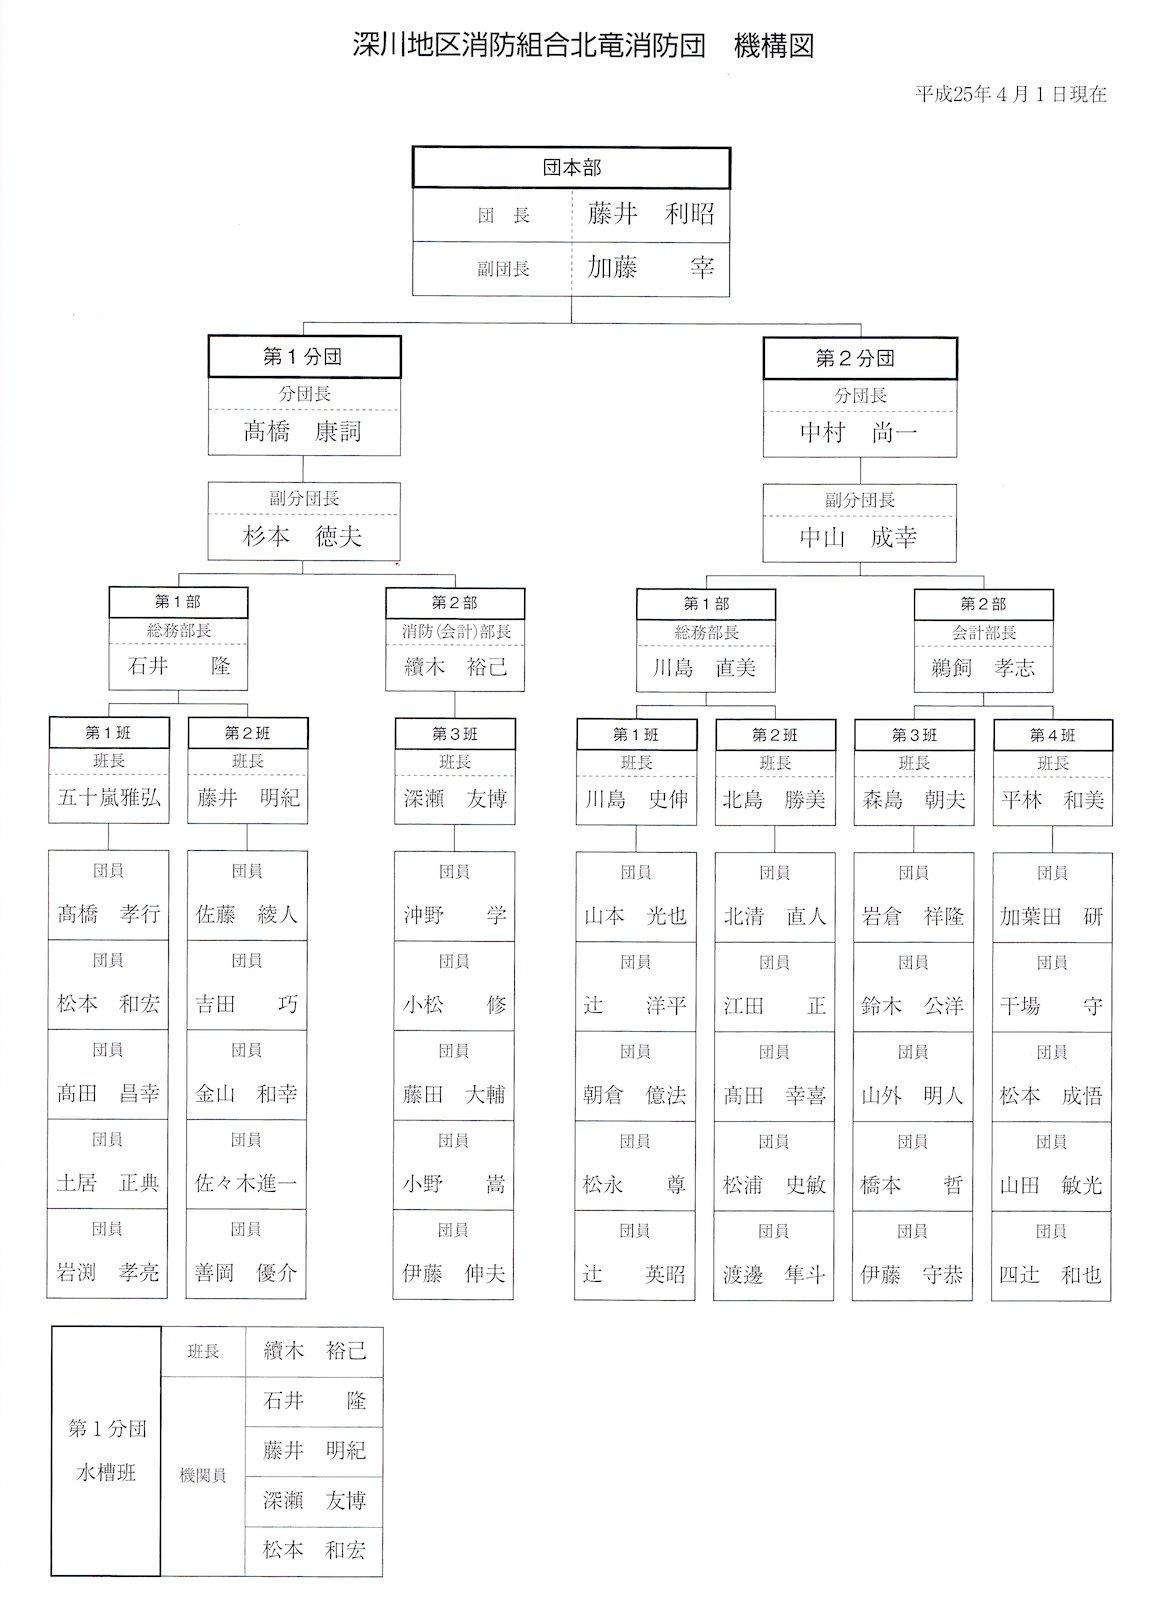 Photo: 北竜消防団・機構図 (2013年4月現在)